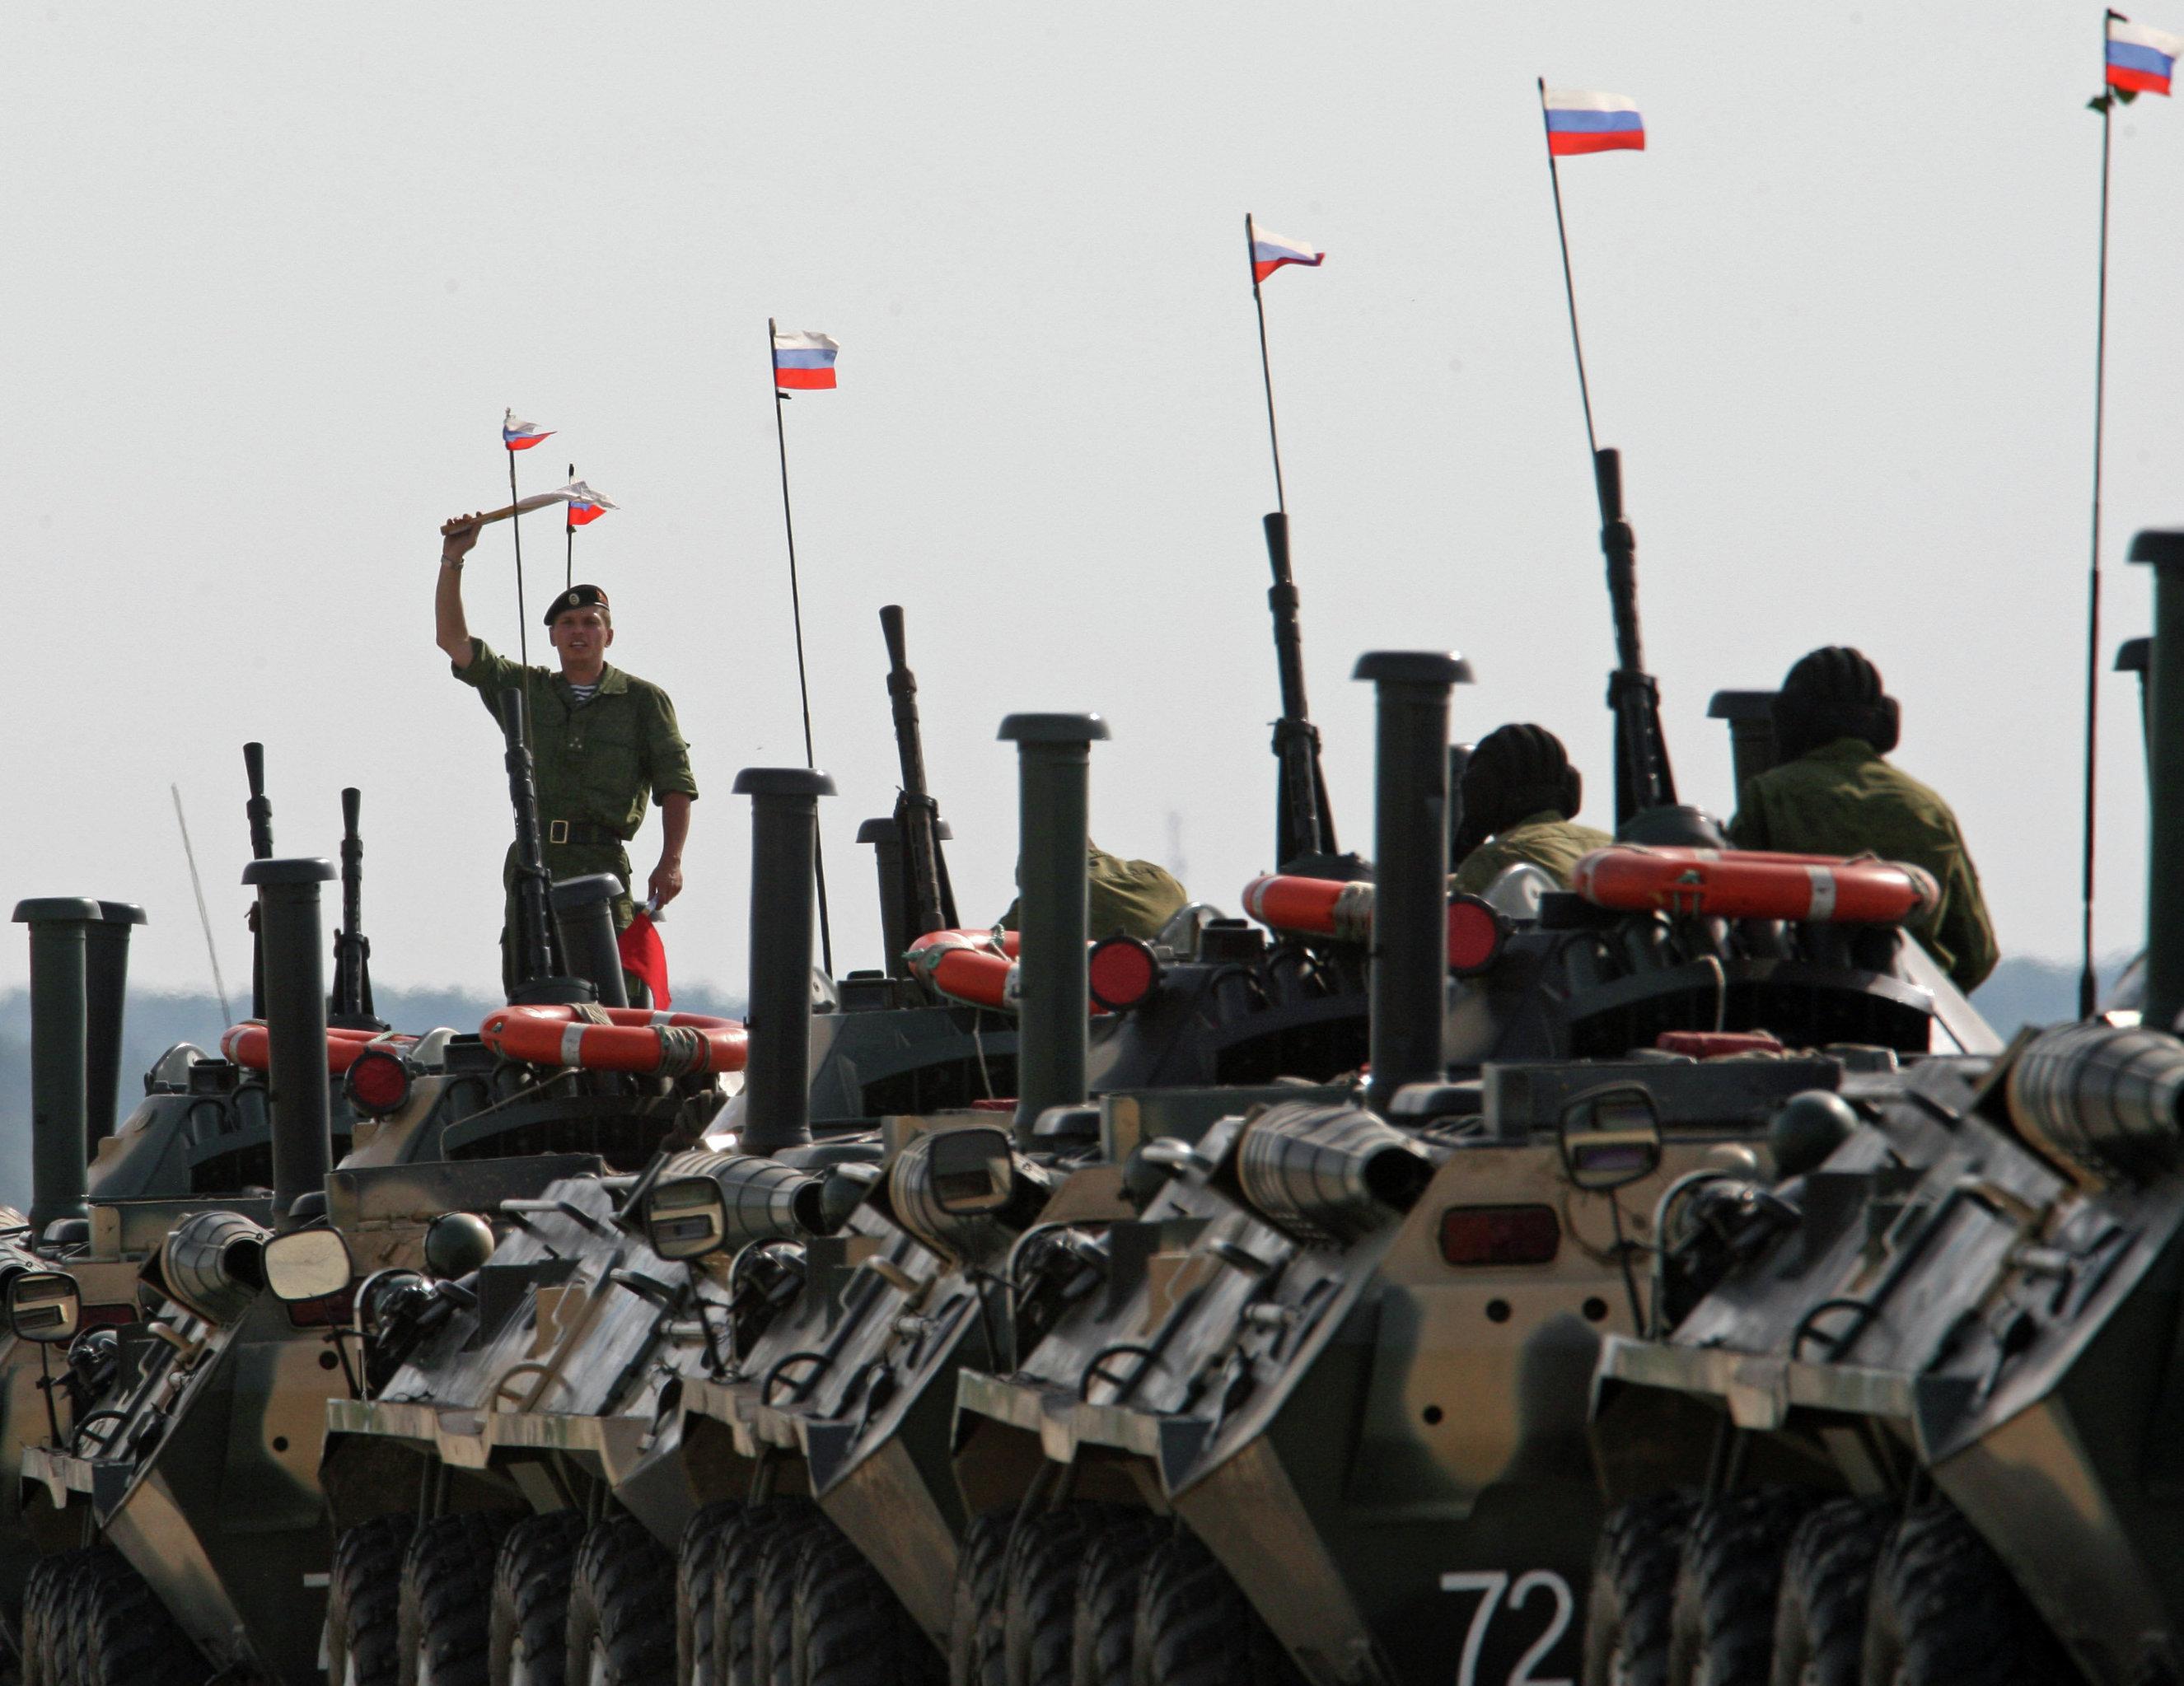 Marine and paratroopers landing drill in Kaliningrad Region